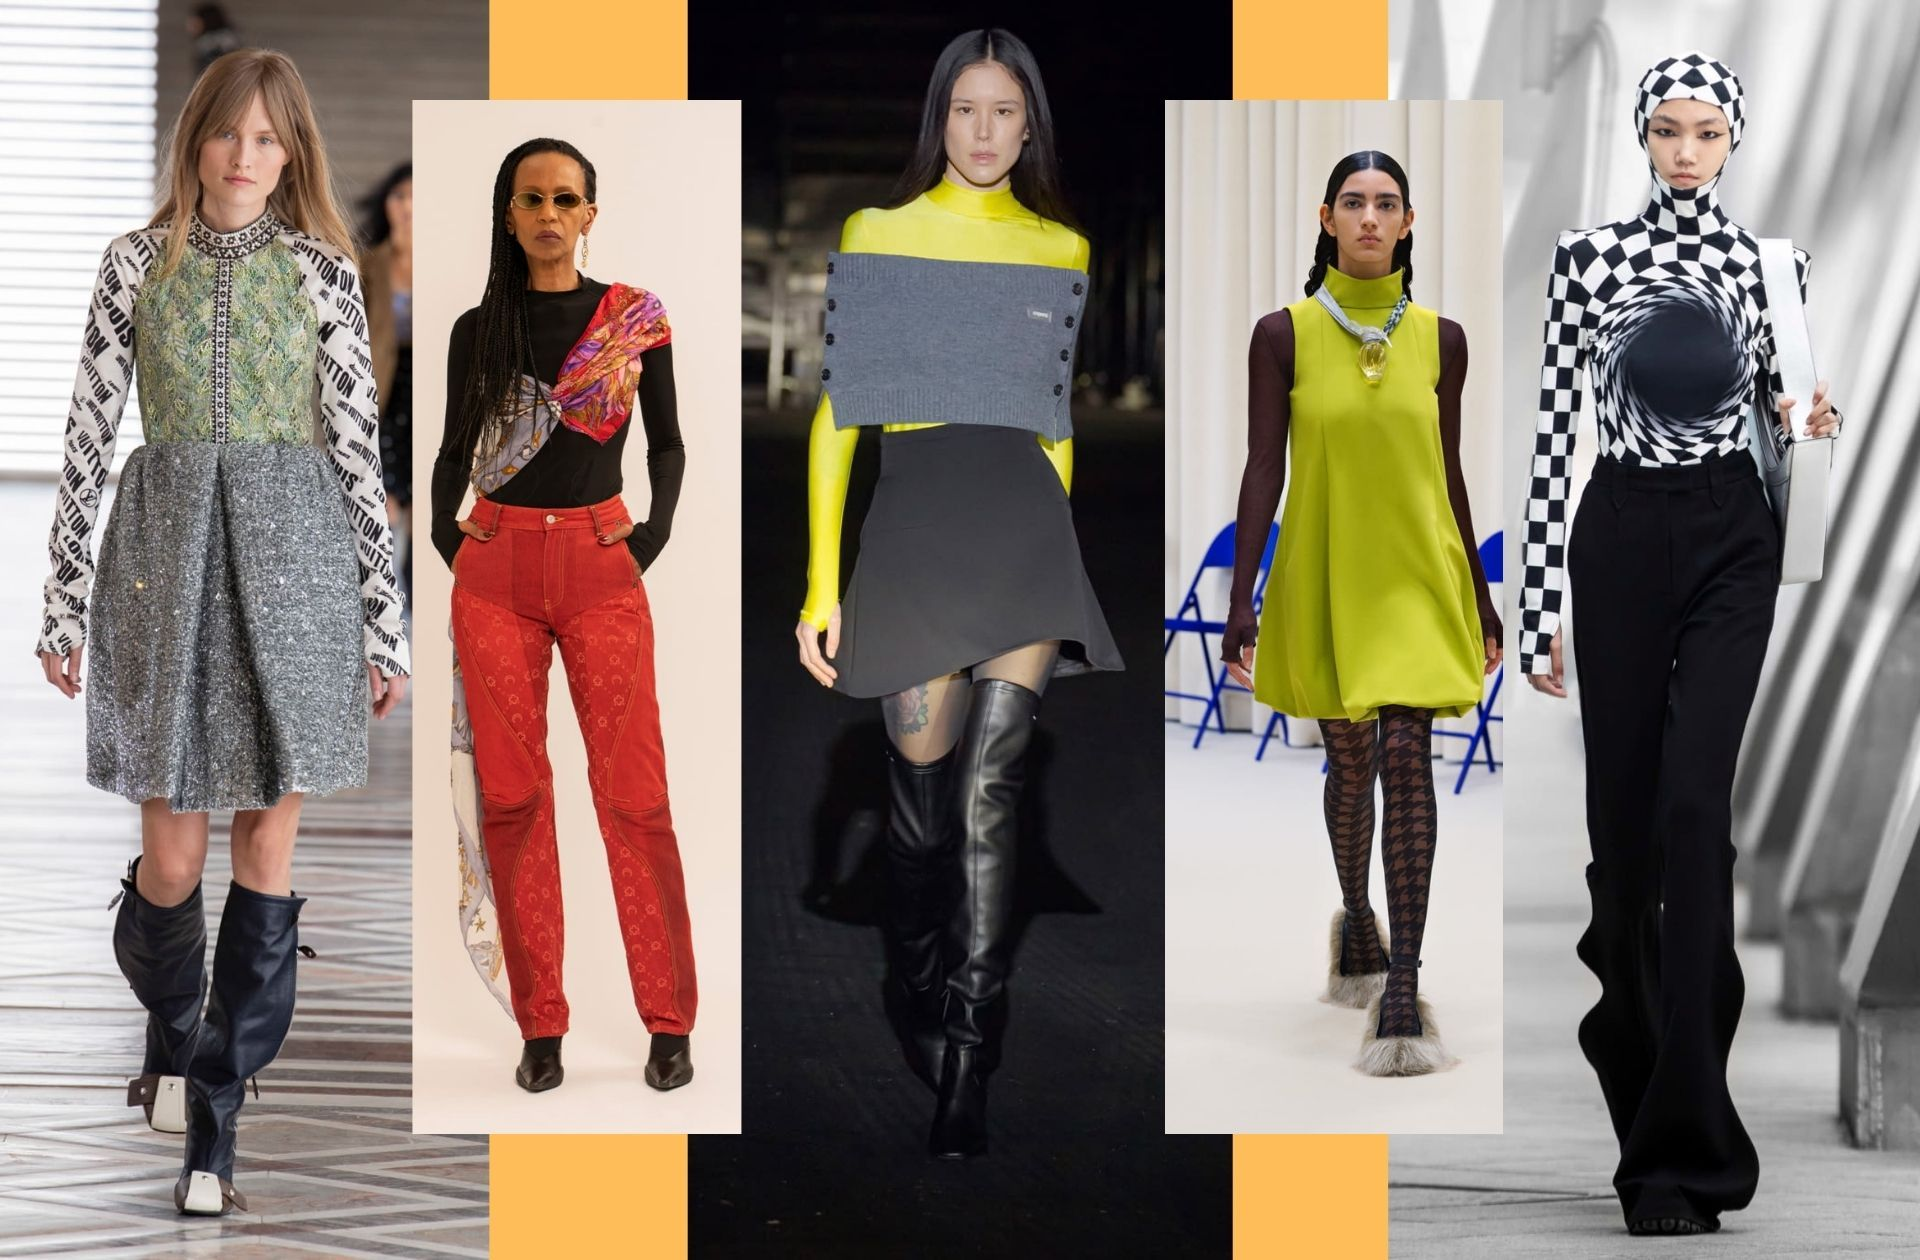 Les hauts seconde peau à manches mitaines chez Louis Vuitton, Marine Serre, Coperni, Nina Ricci, Annakiki